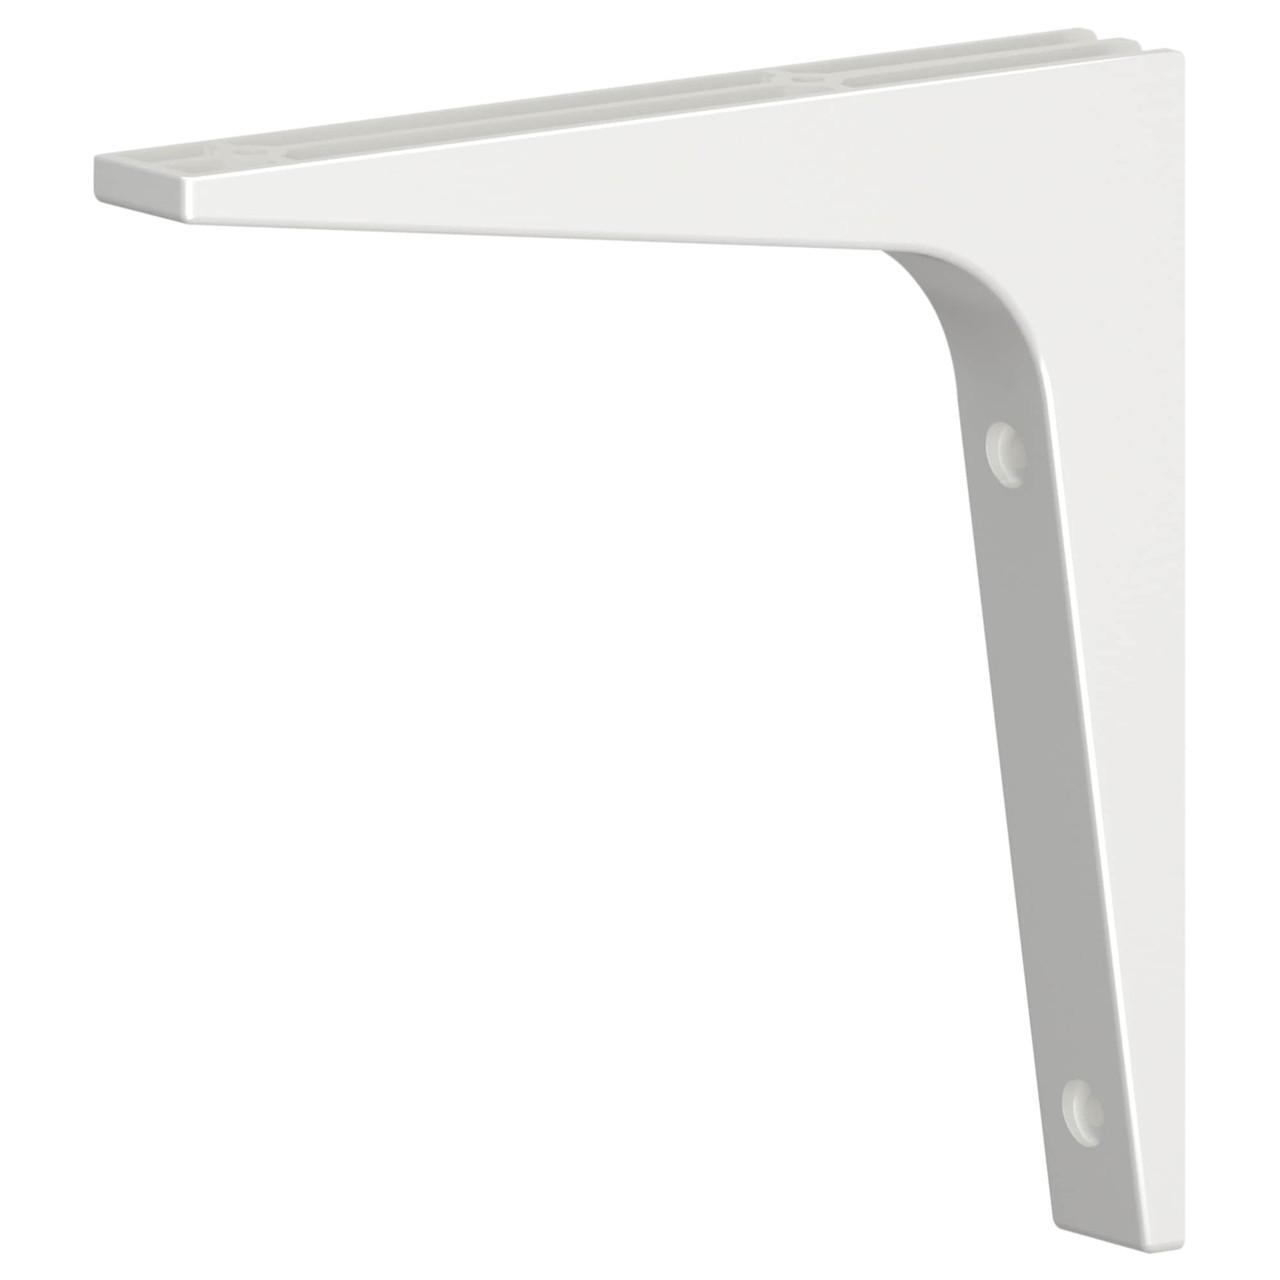 IKEA EKBY STODIS (801.420.67) Кронштейн белый